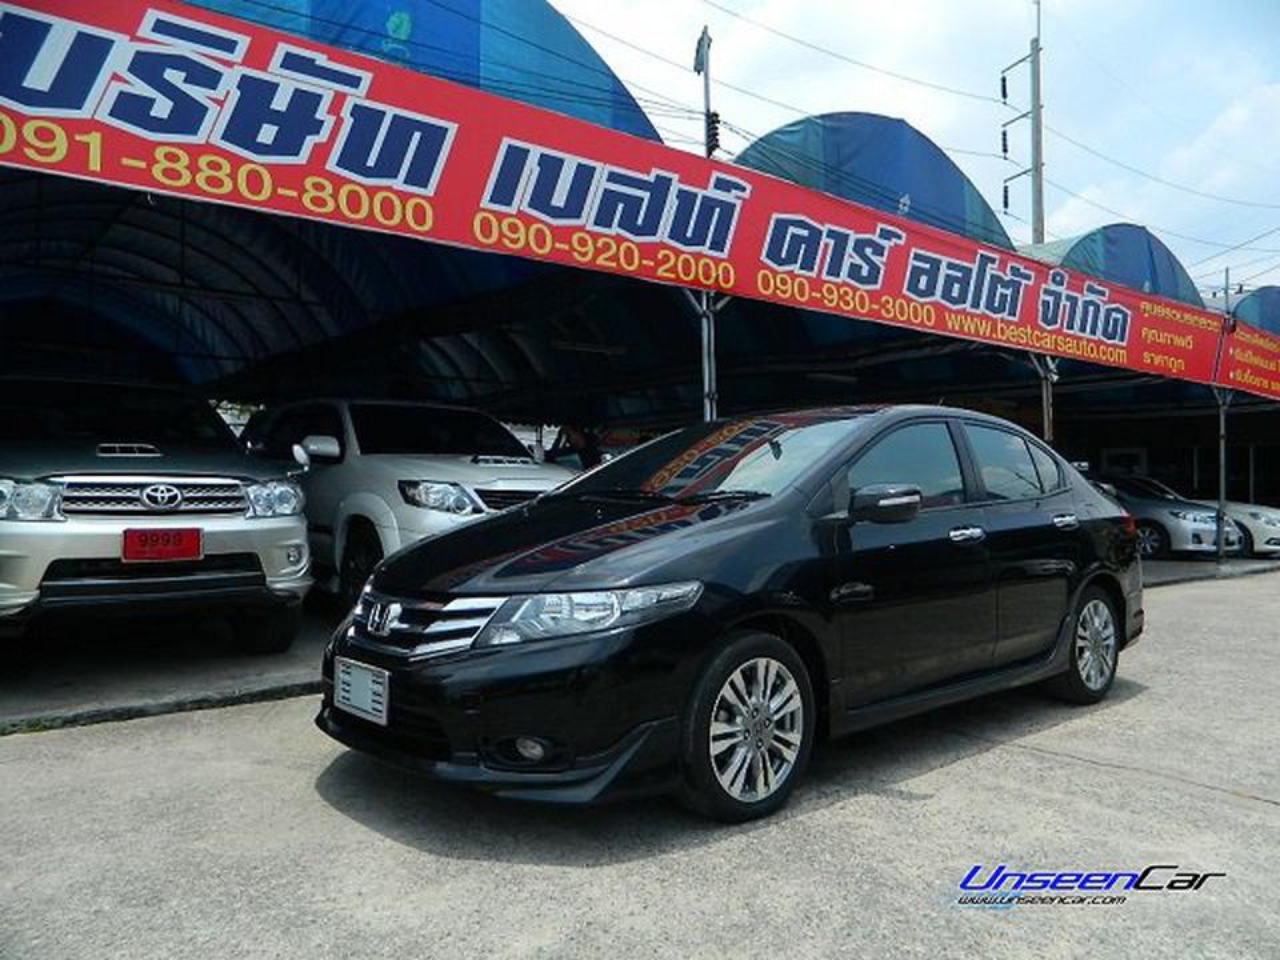 HONDA CITY i-VTEC 1.5(BEST CARS AUTO 14) รูปที่ 2